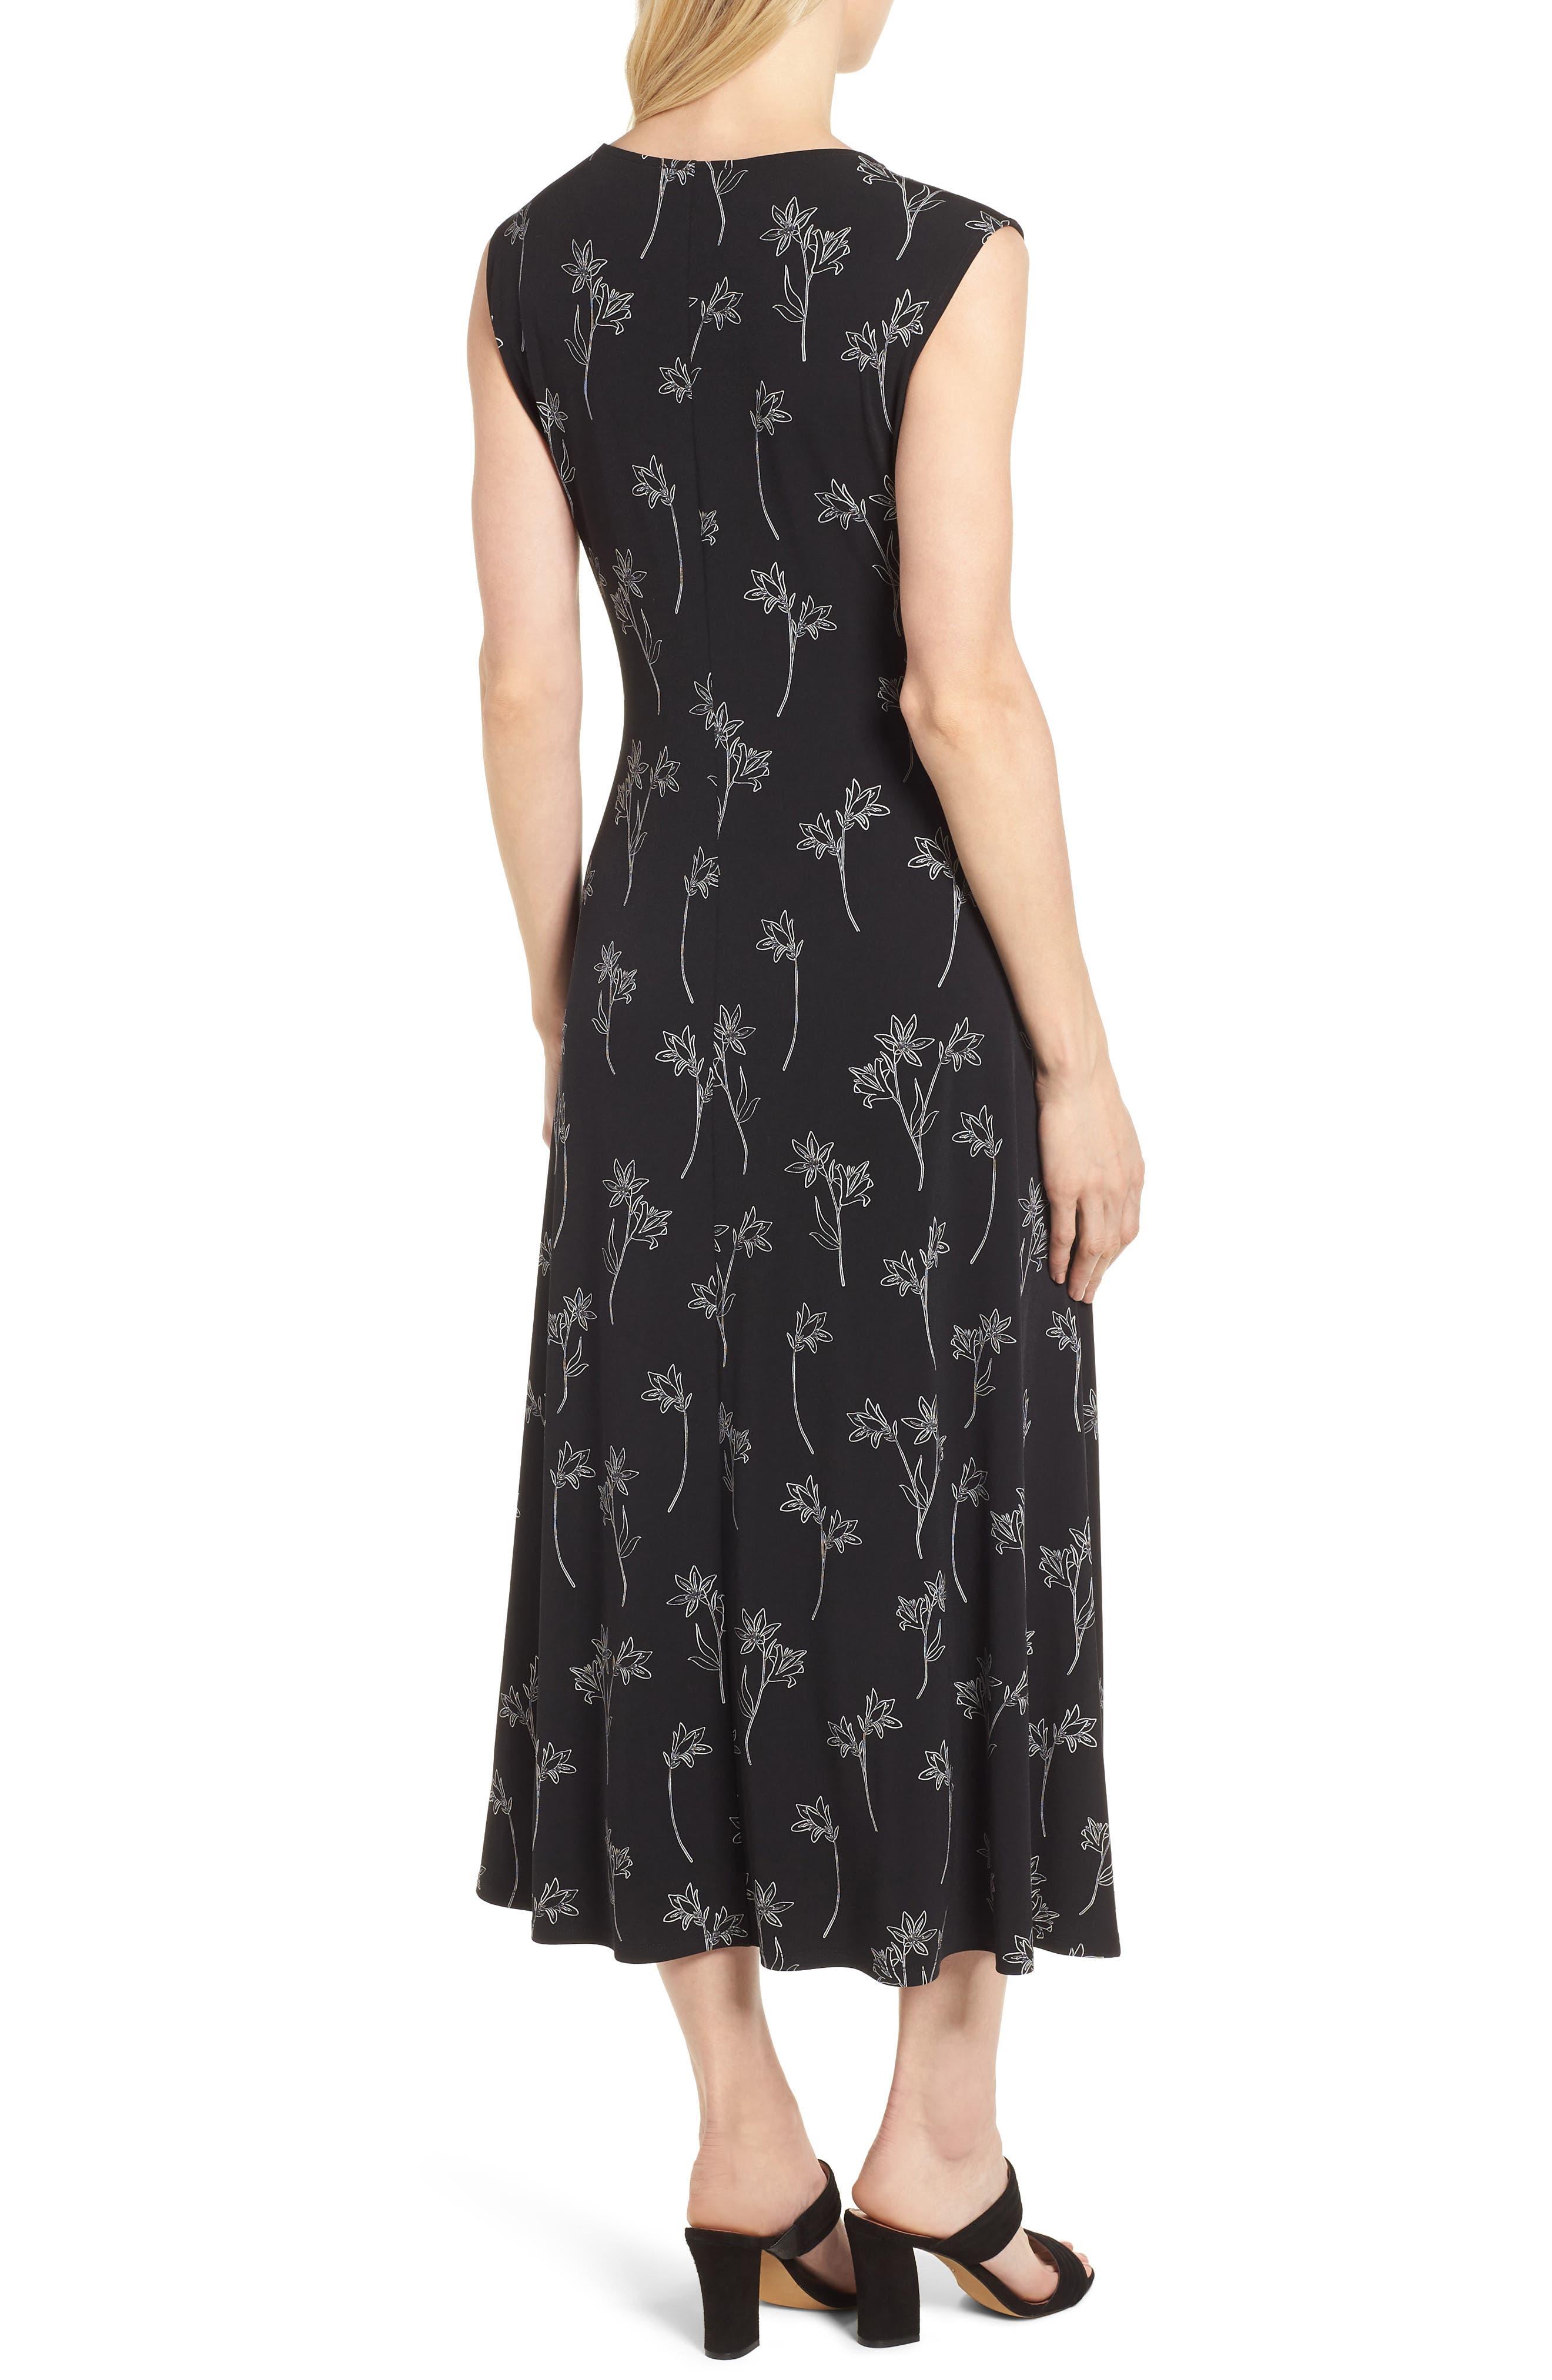 Floral Outlines Knot Front Maxi Dress,                             Alternate thumbnail 2, color,                             060-Rich Black